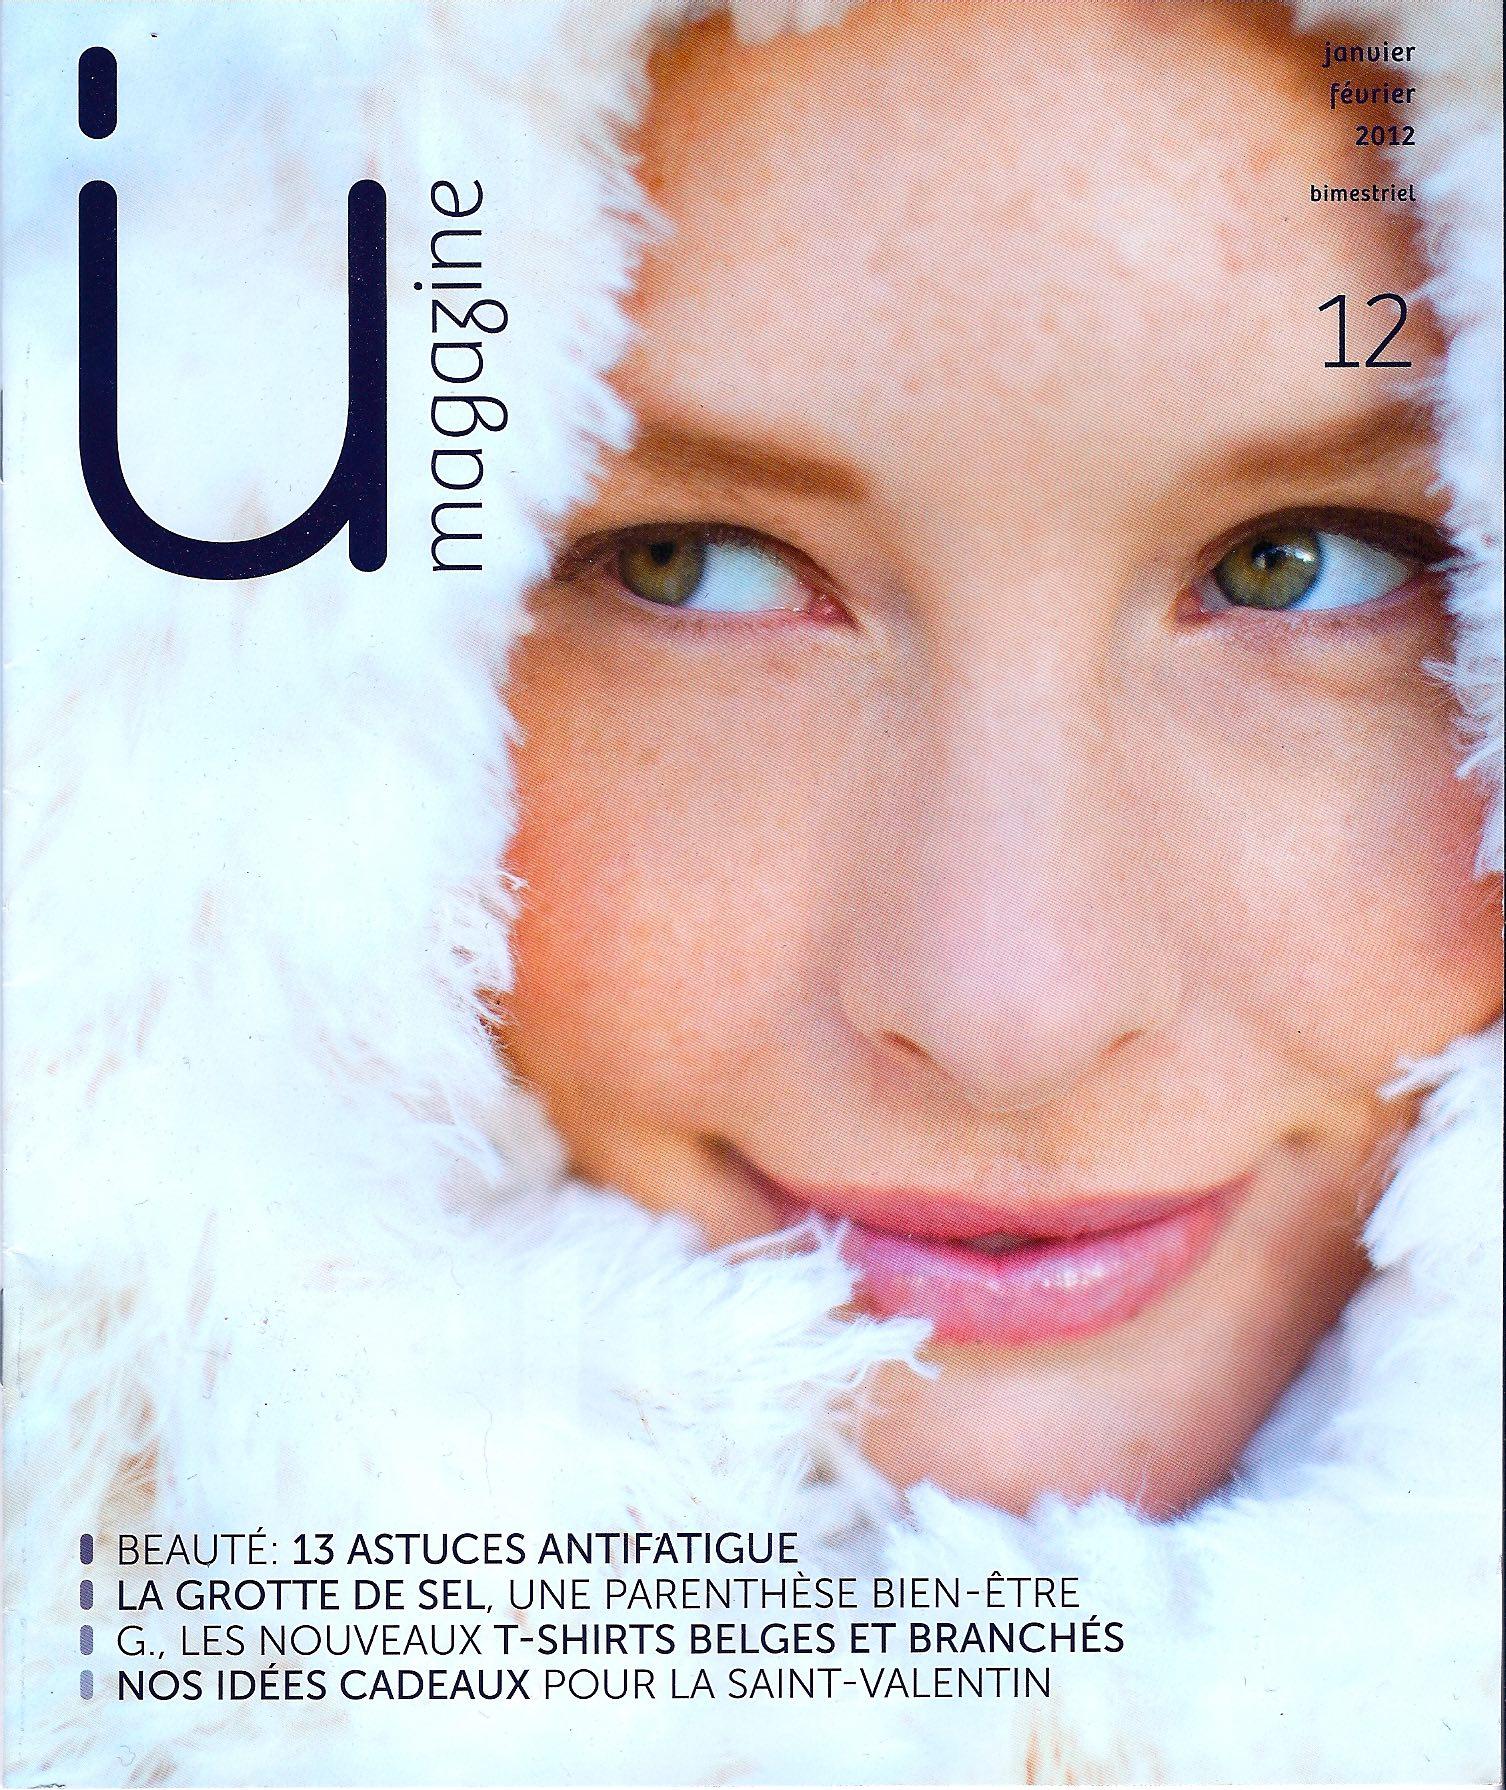 NataMakeUp - UI magazine - cover - 13 astuces antifatigues